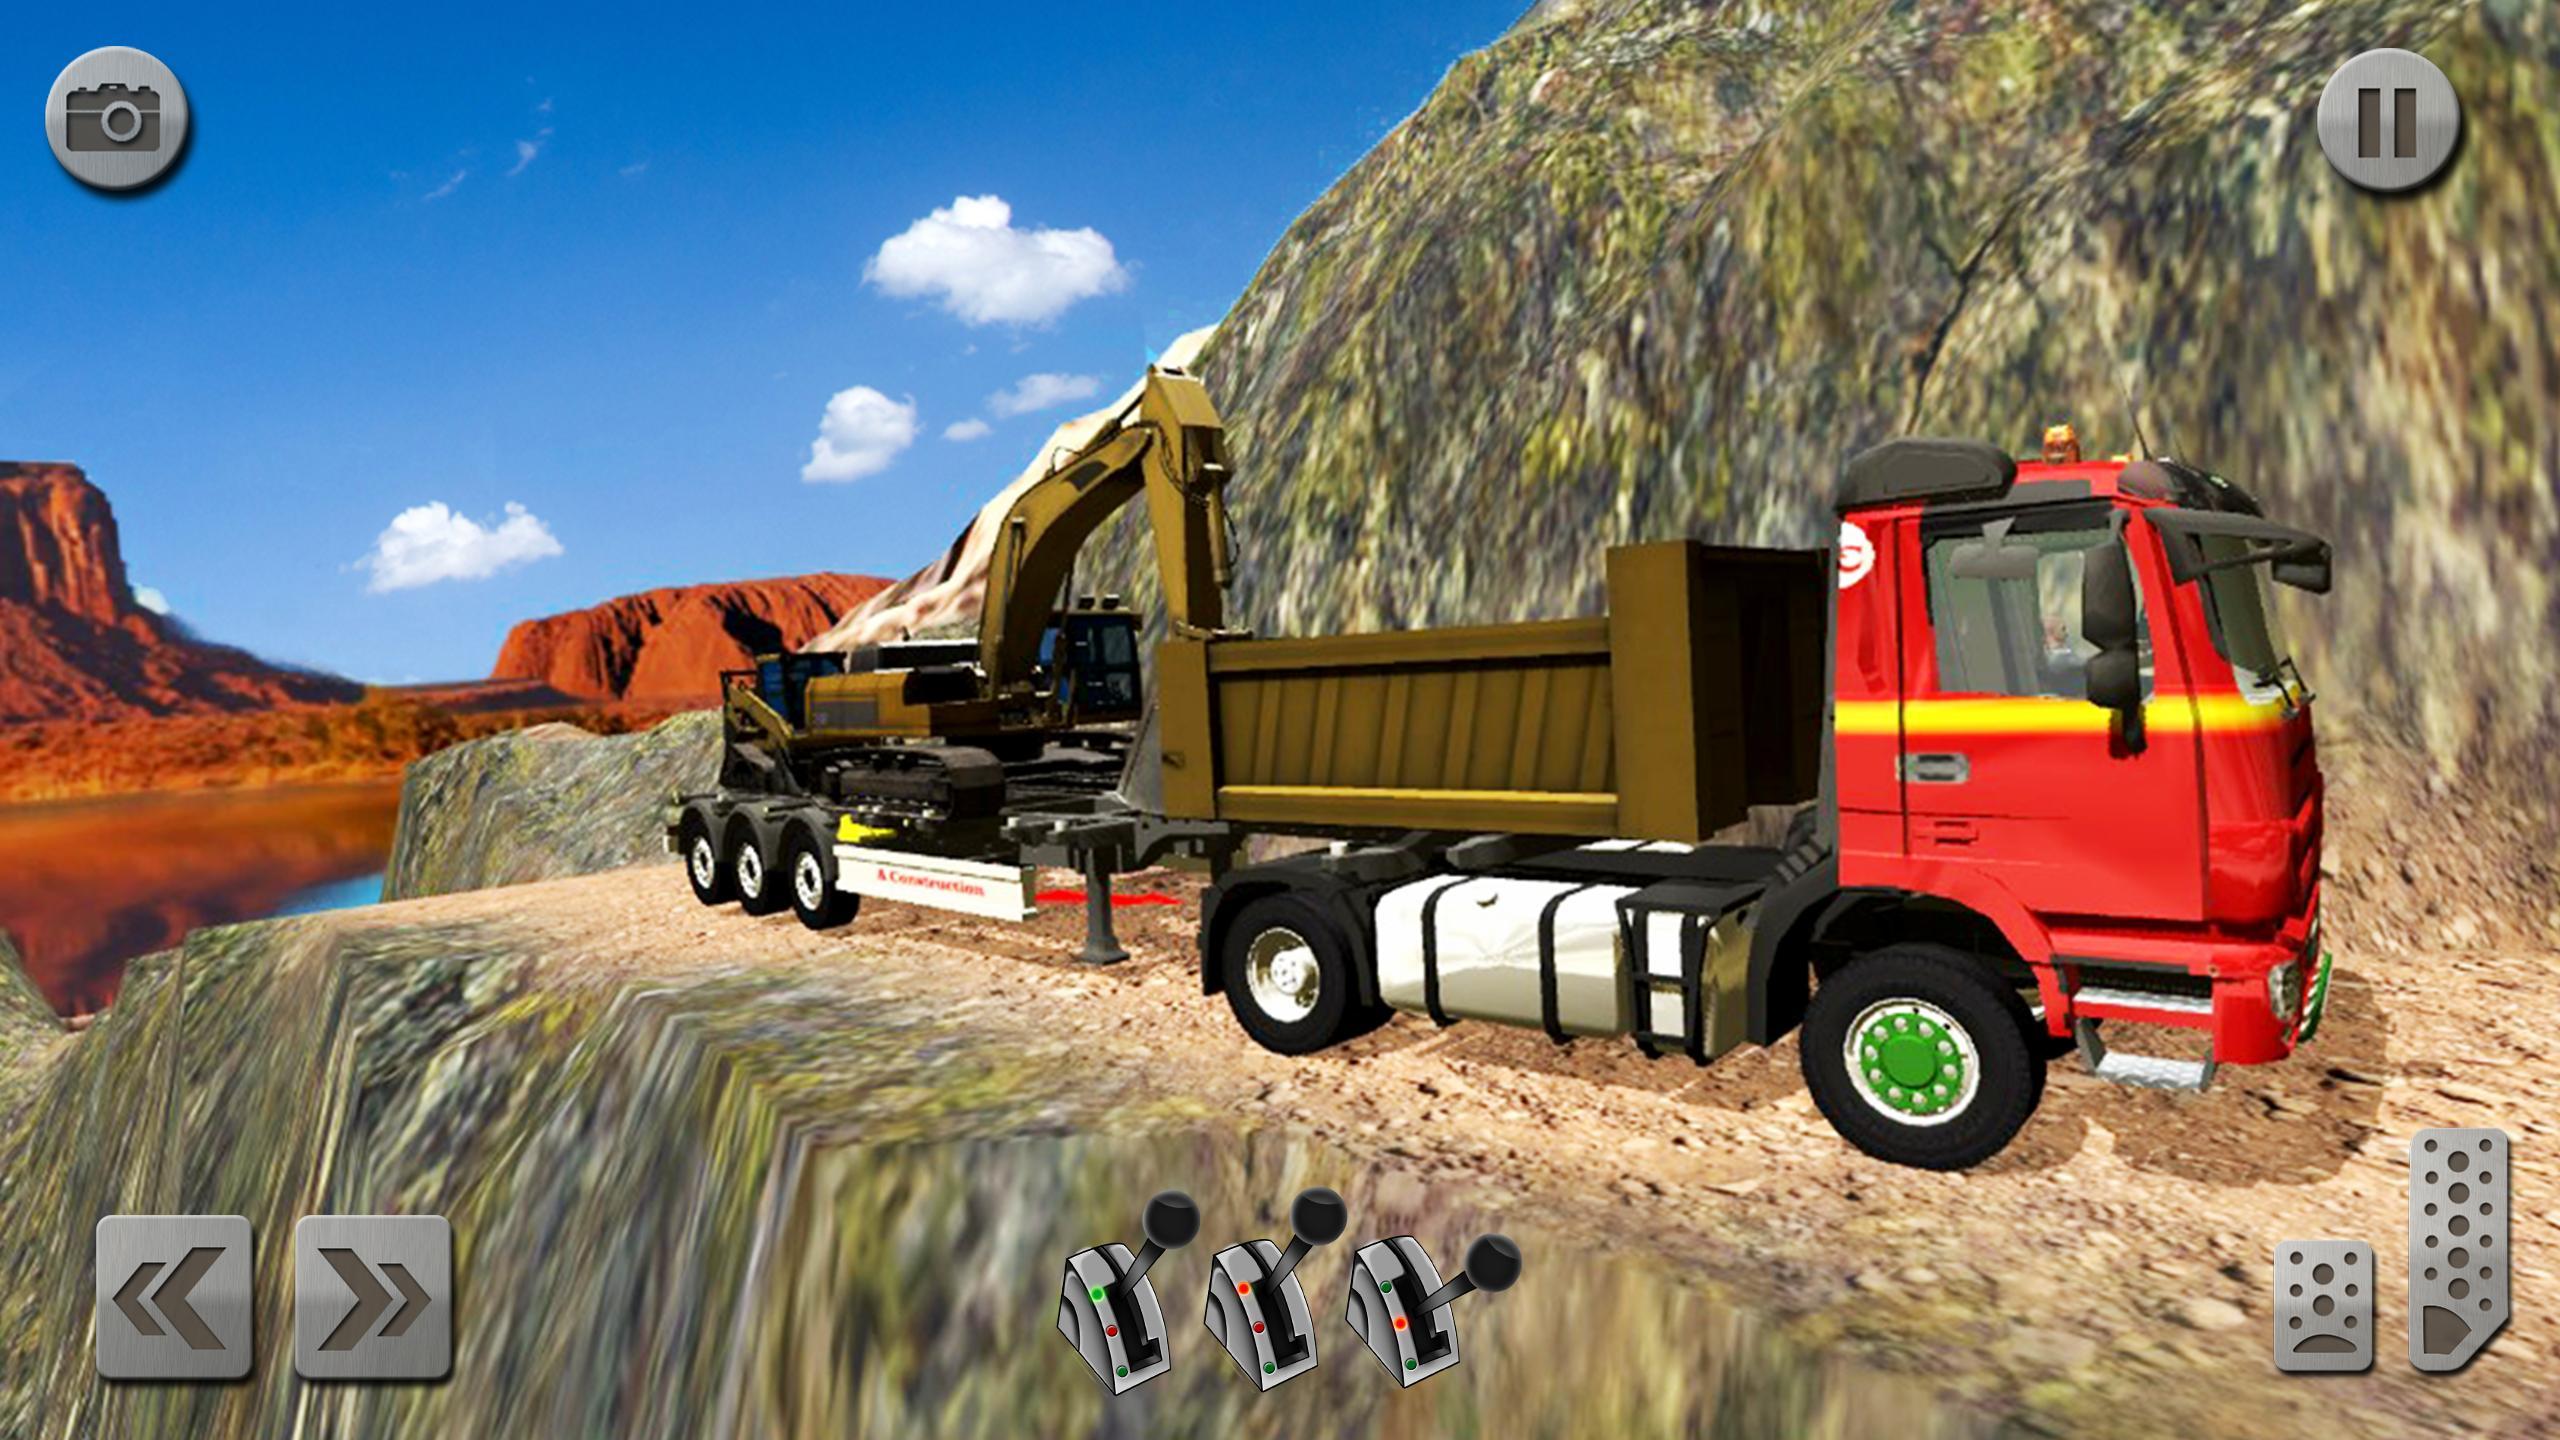 Sand Excavator Truck Driving Rescue Simulator game 5.2 Screenshot 5